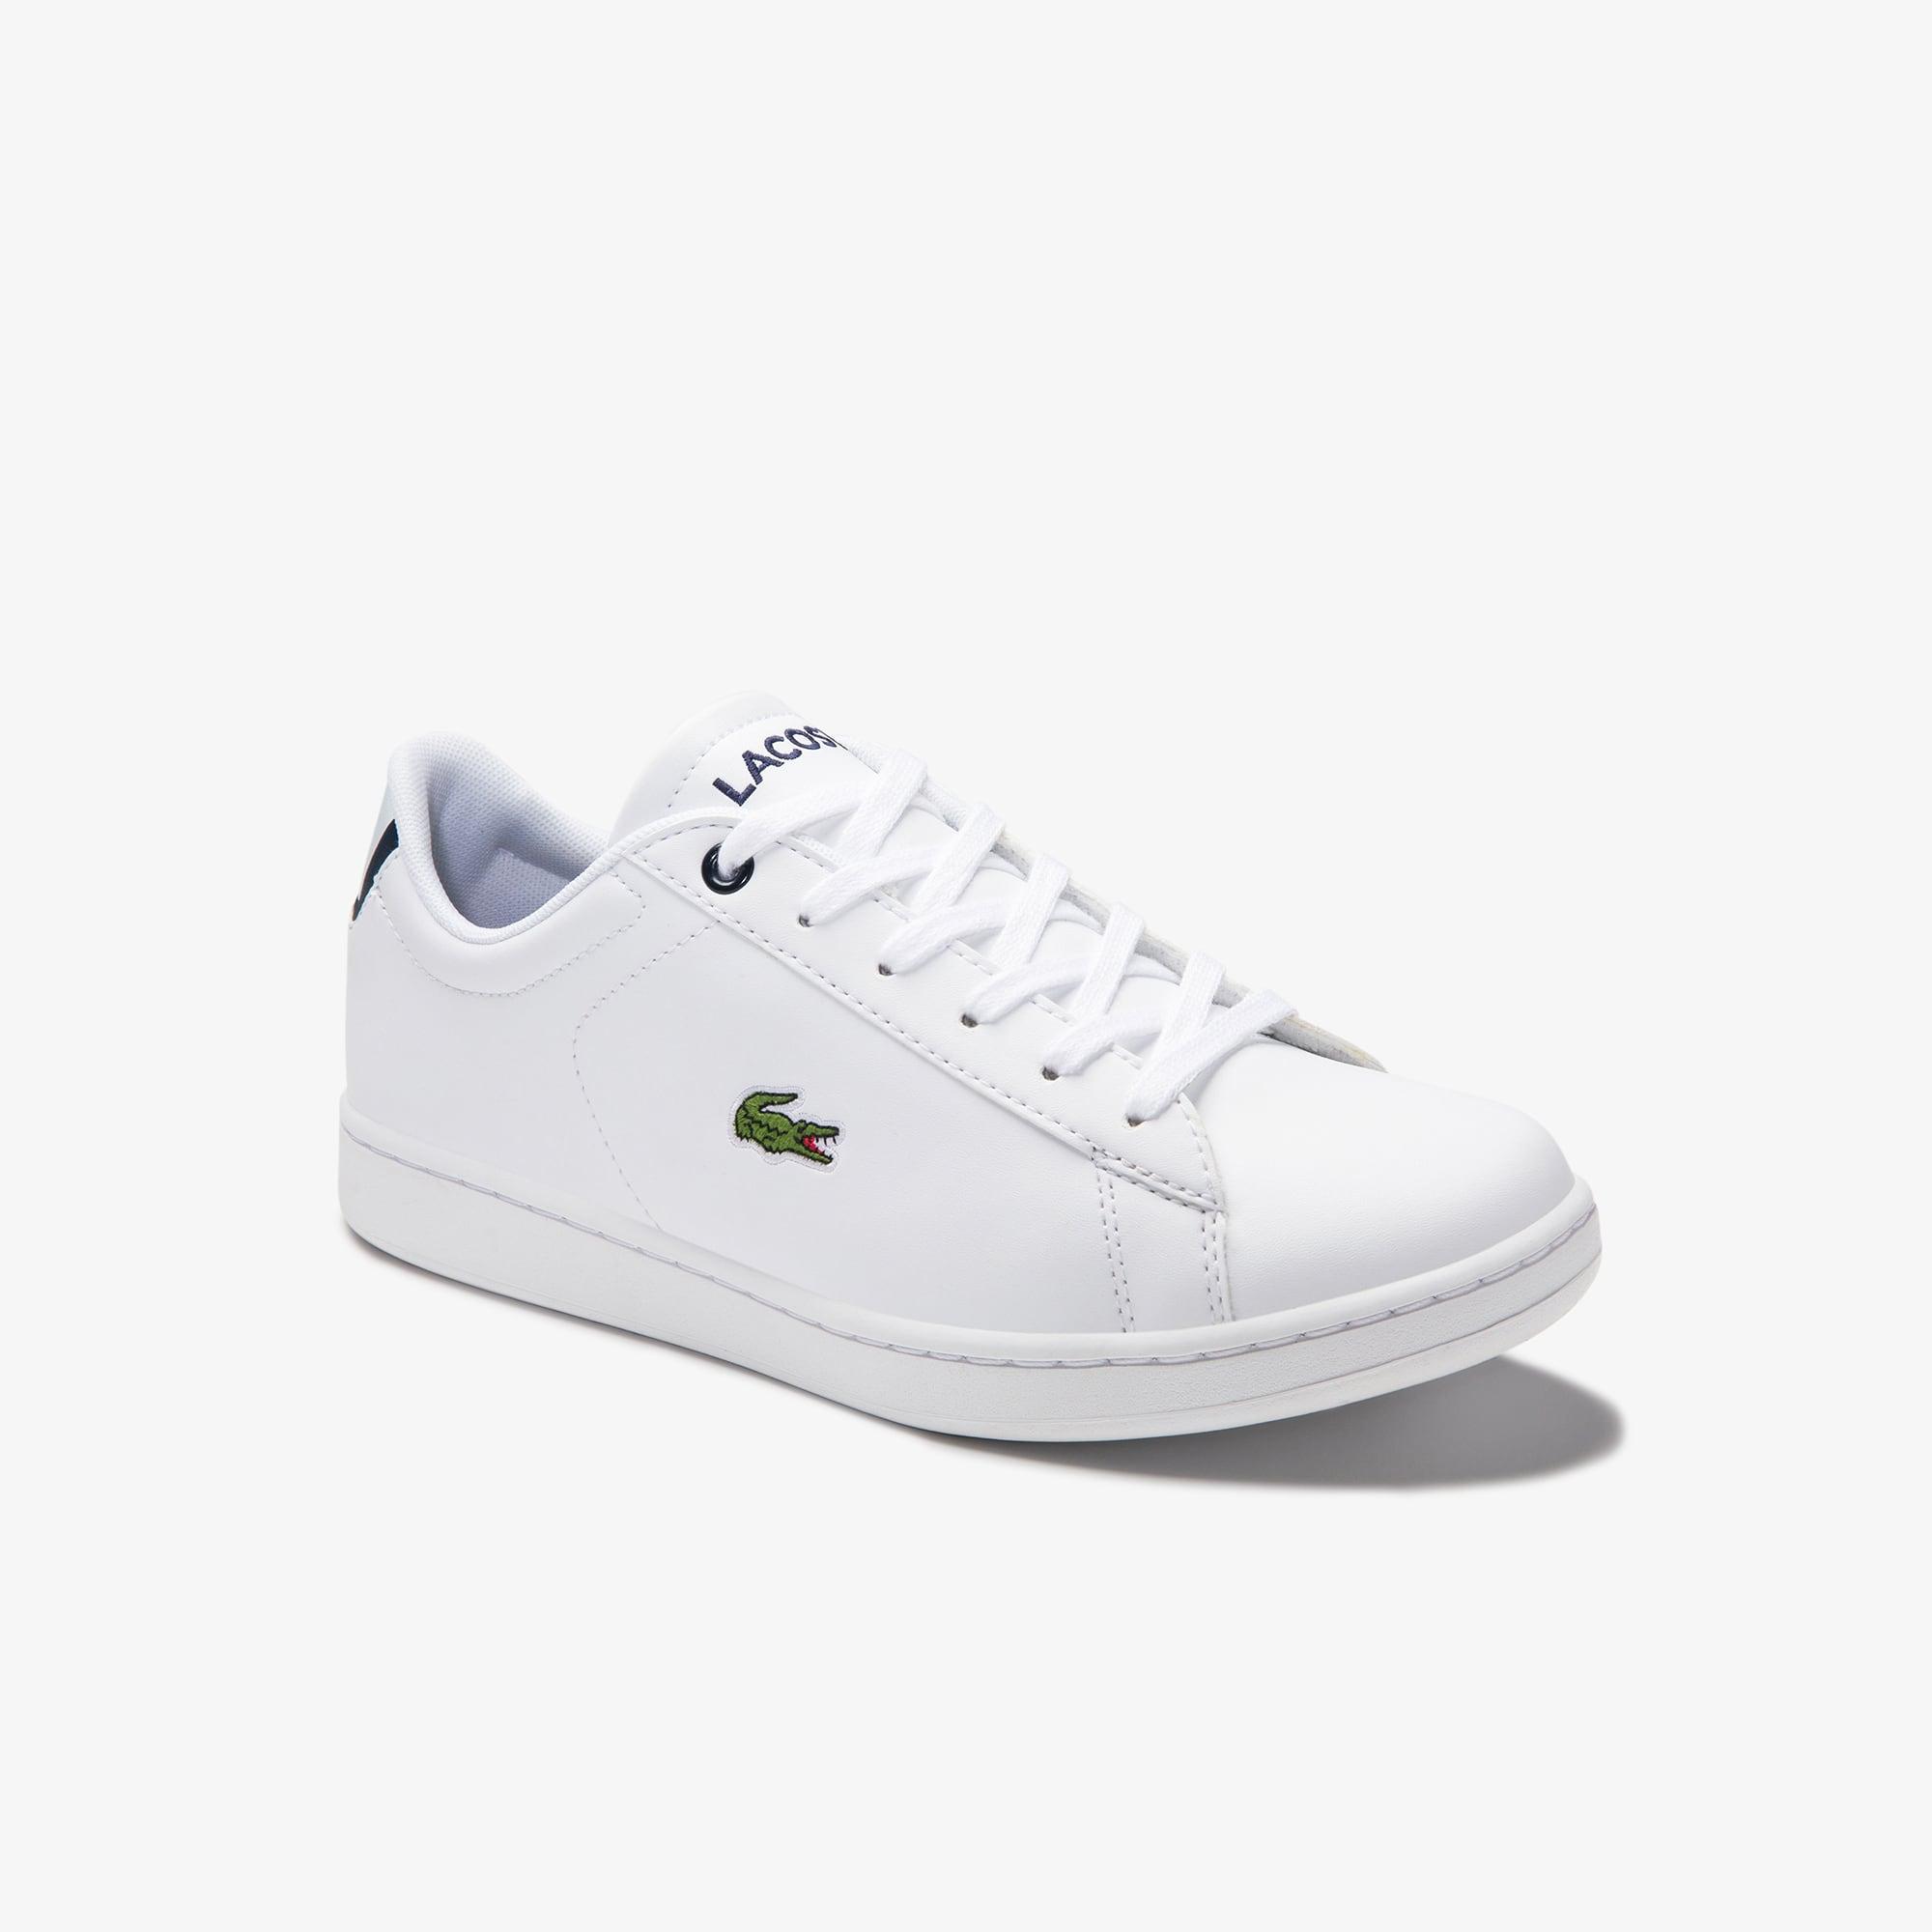 2047bafbd7d Sneakers Carnaby Evo ado en synthétique